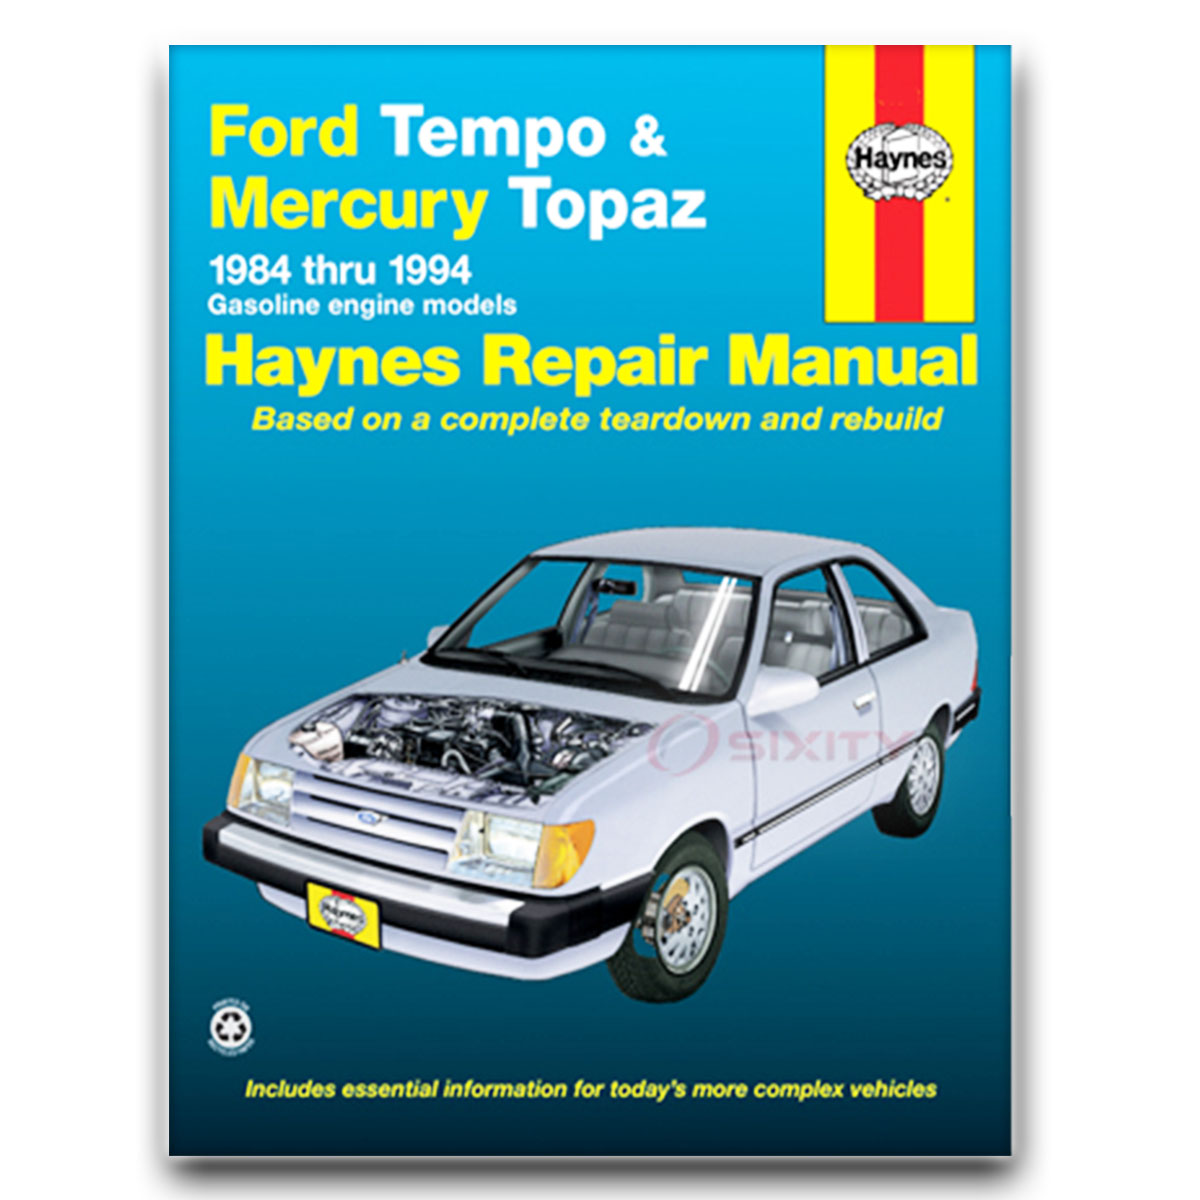 Ford Tempo Haynes Repair Manual AWD L Sport LX GLX Base GLS Shop Service hj